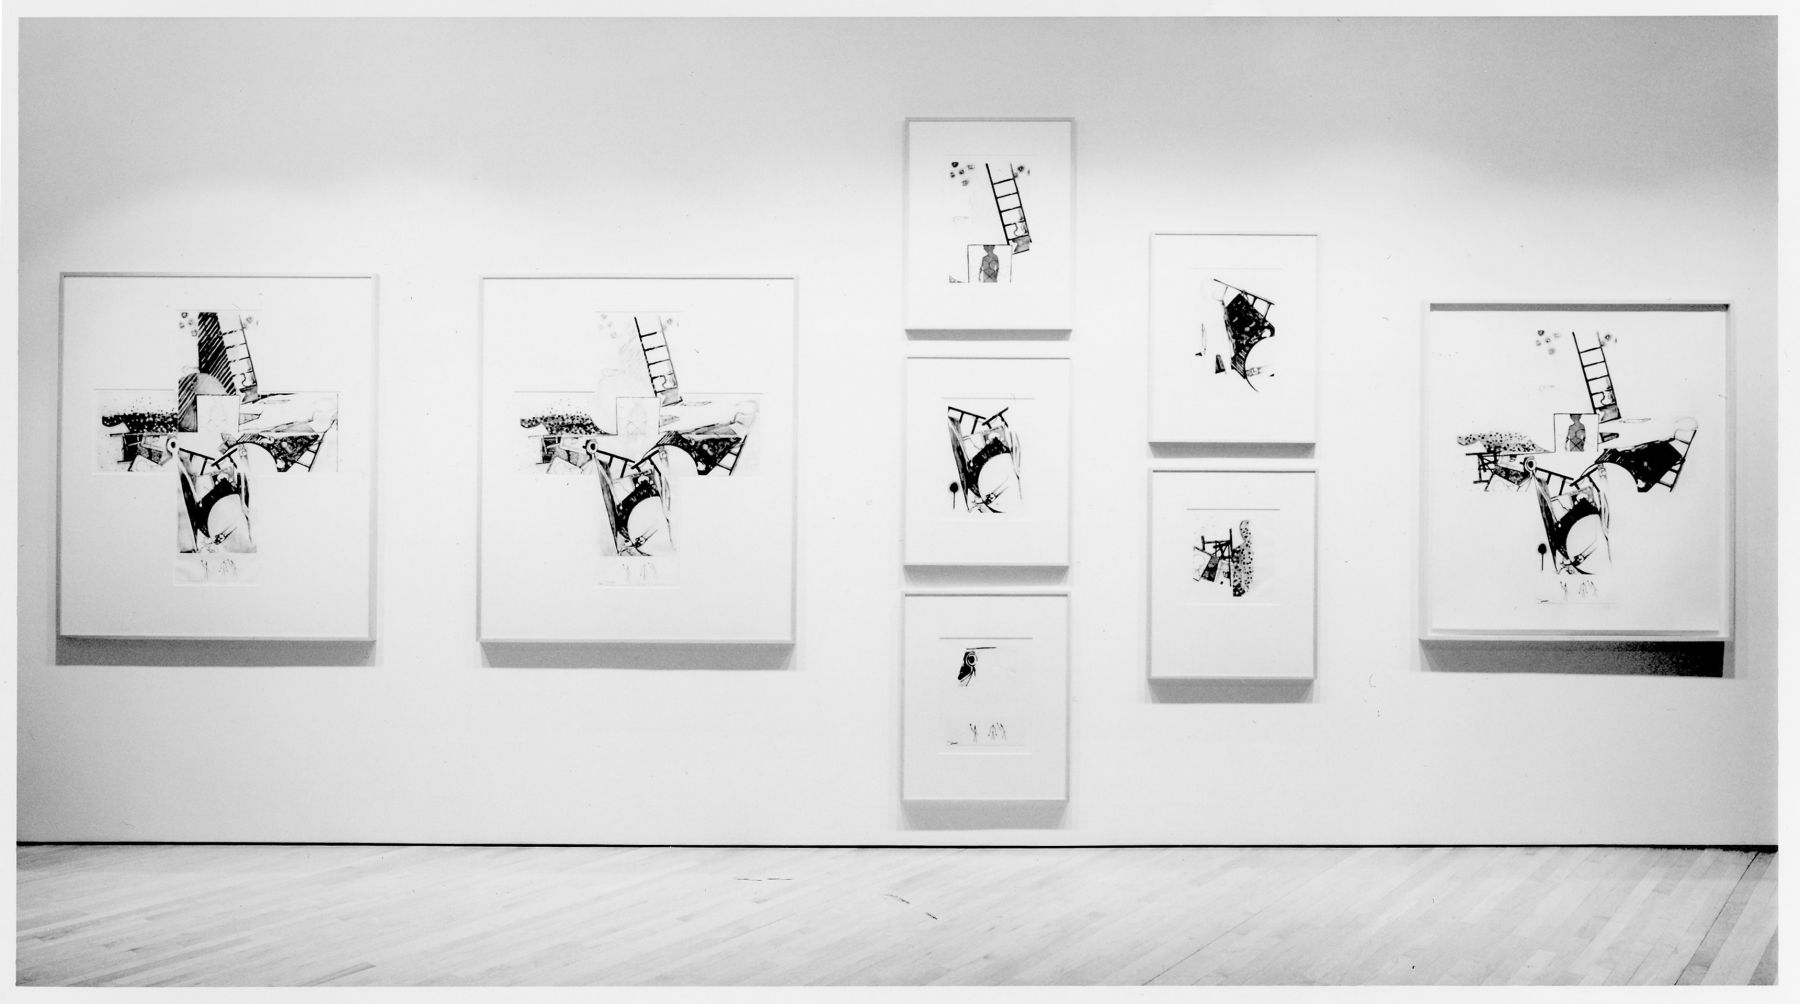 Jasper Johns, The Seasons Nov 9,1991-Jan 4,1992